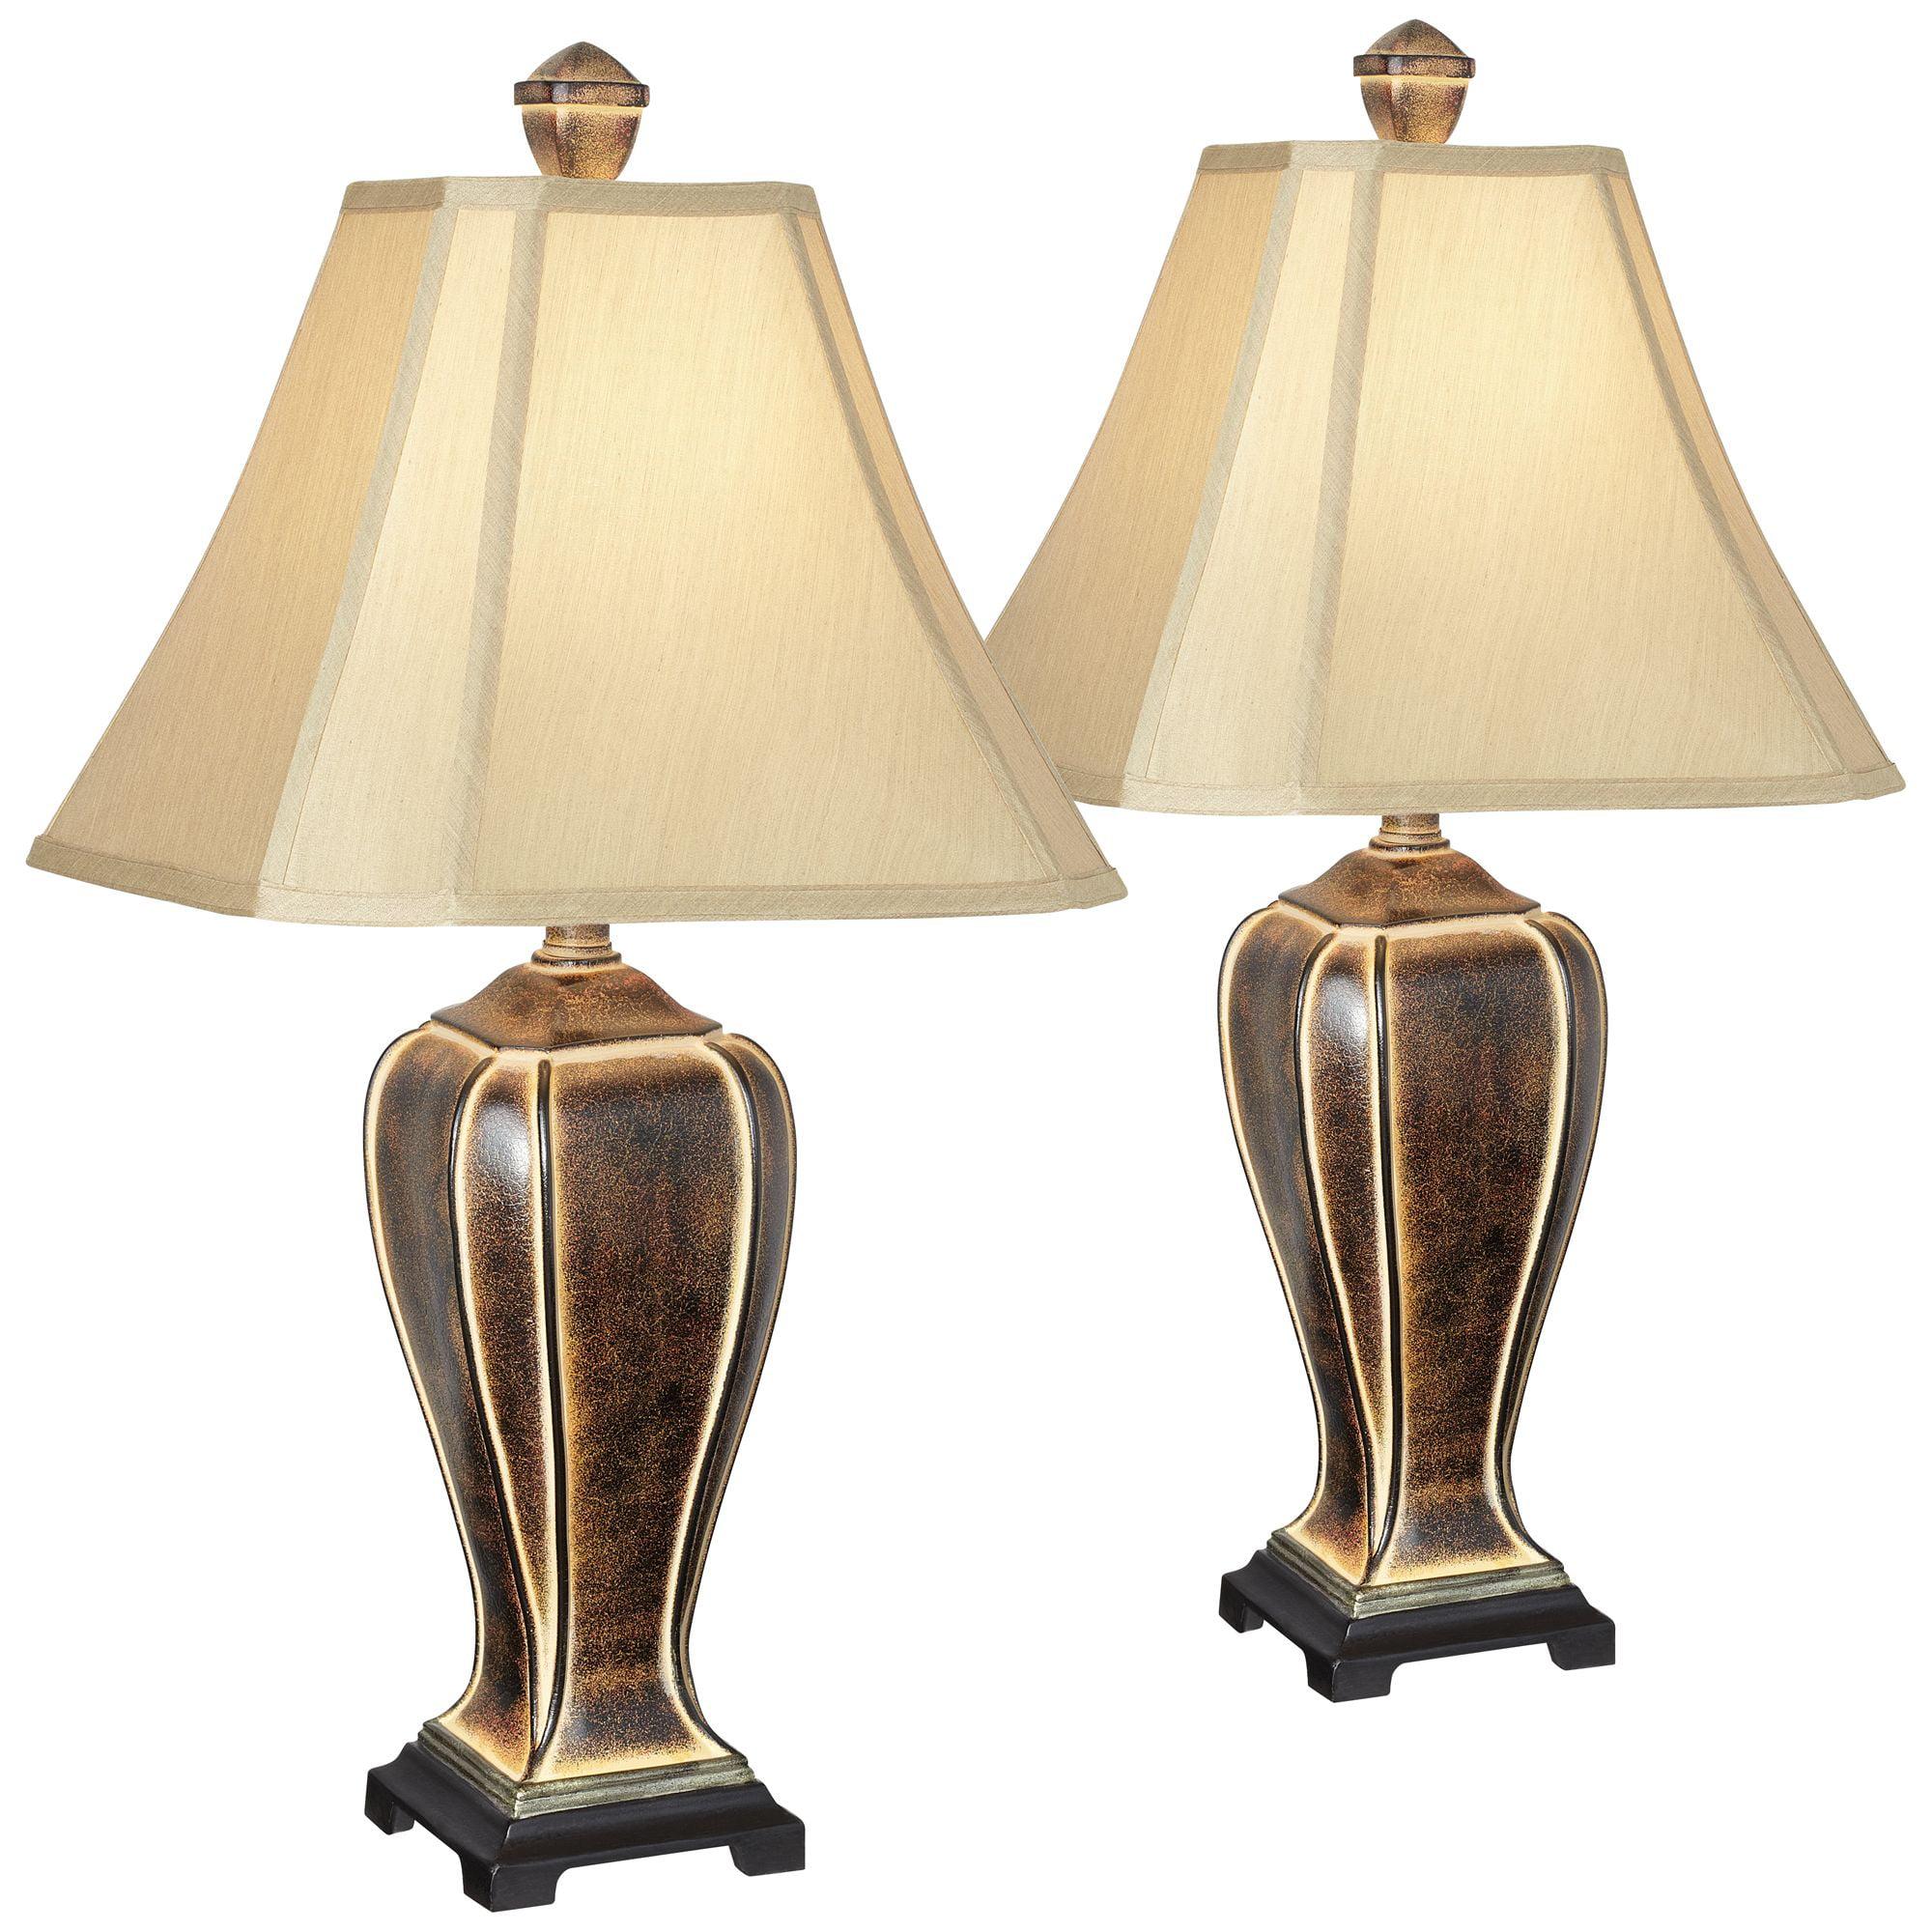 Regency Hill Traditional Table Lamps Set Of 2 Desert Crackle Gold Jar Taupe Faux Silk Bell Shade For Living Room Family Bedroom Walmart Com Walmart Com